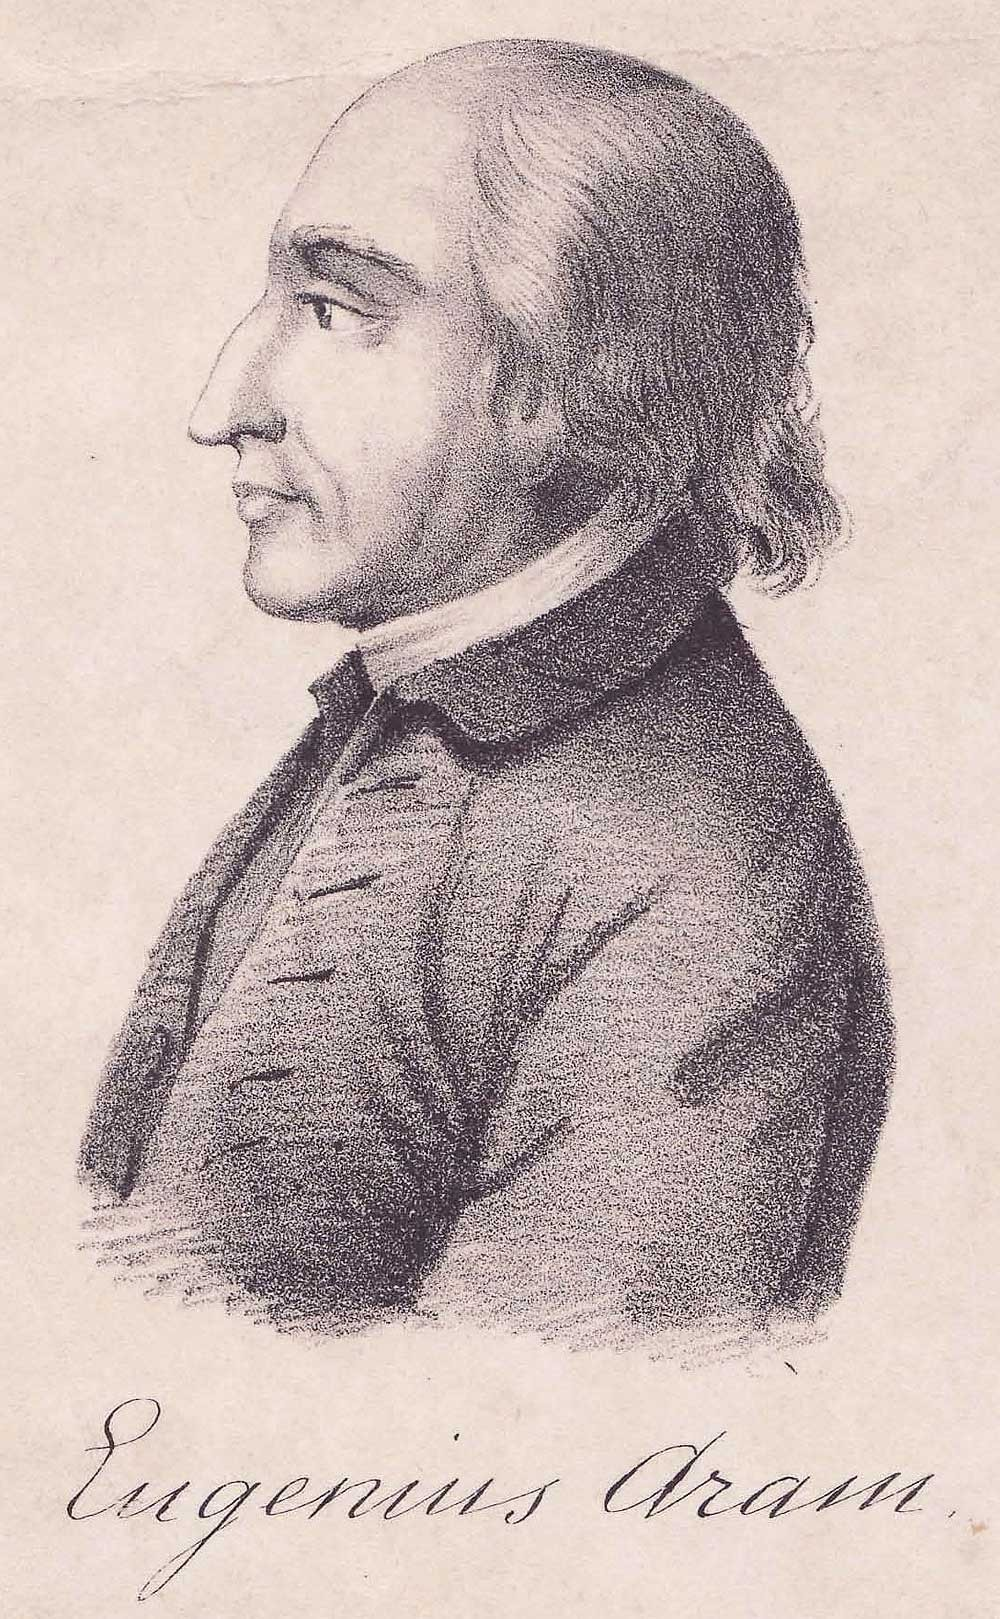 A contemporary engraving of the academic, teacher and murderer Eugene Aram